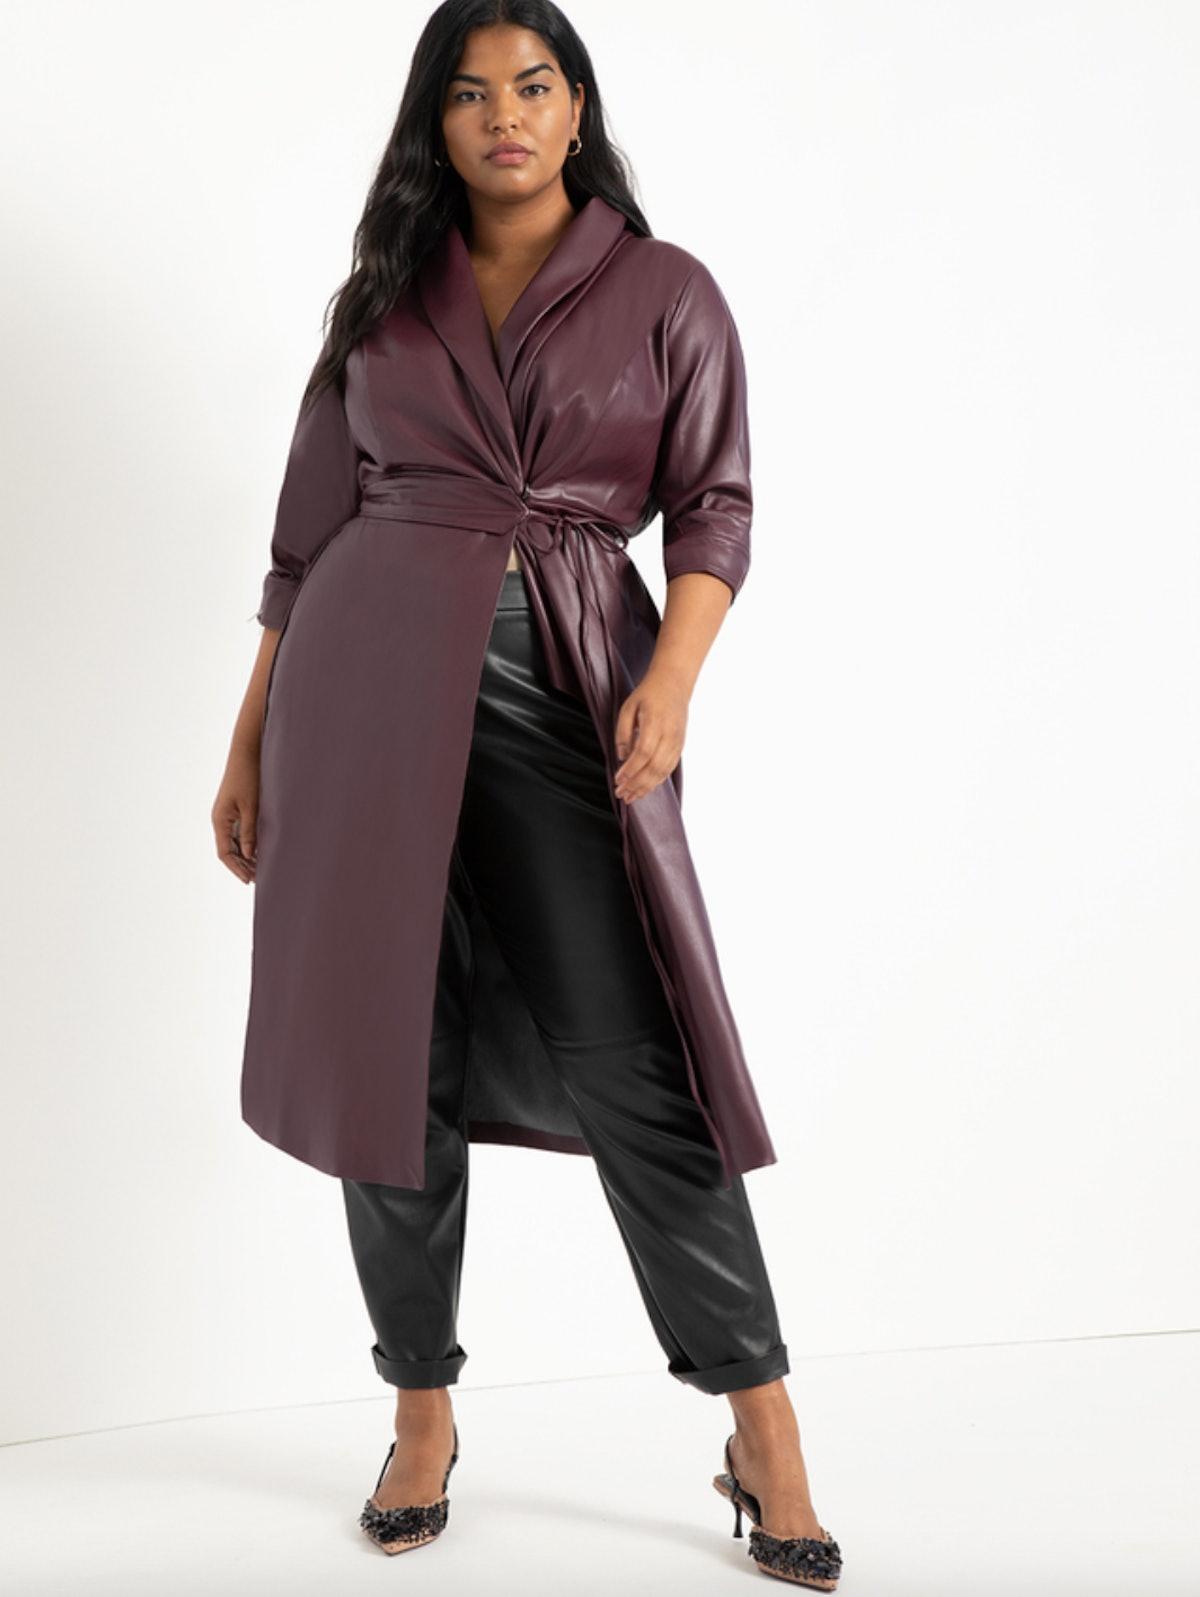 Shawl Collar Vegan Leather Dress